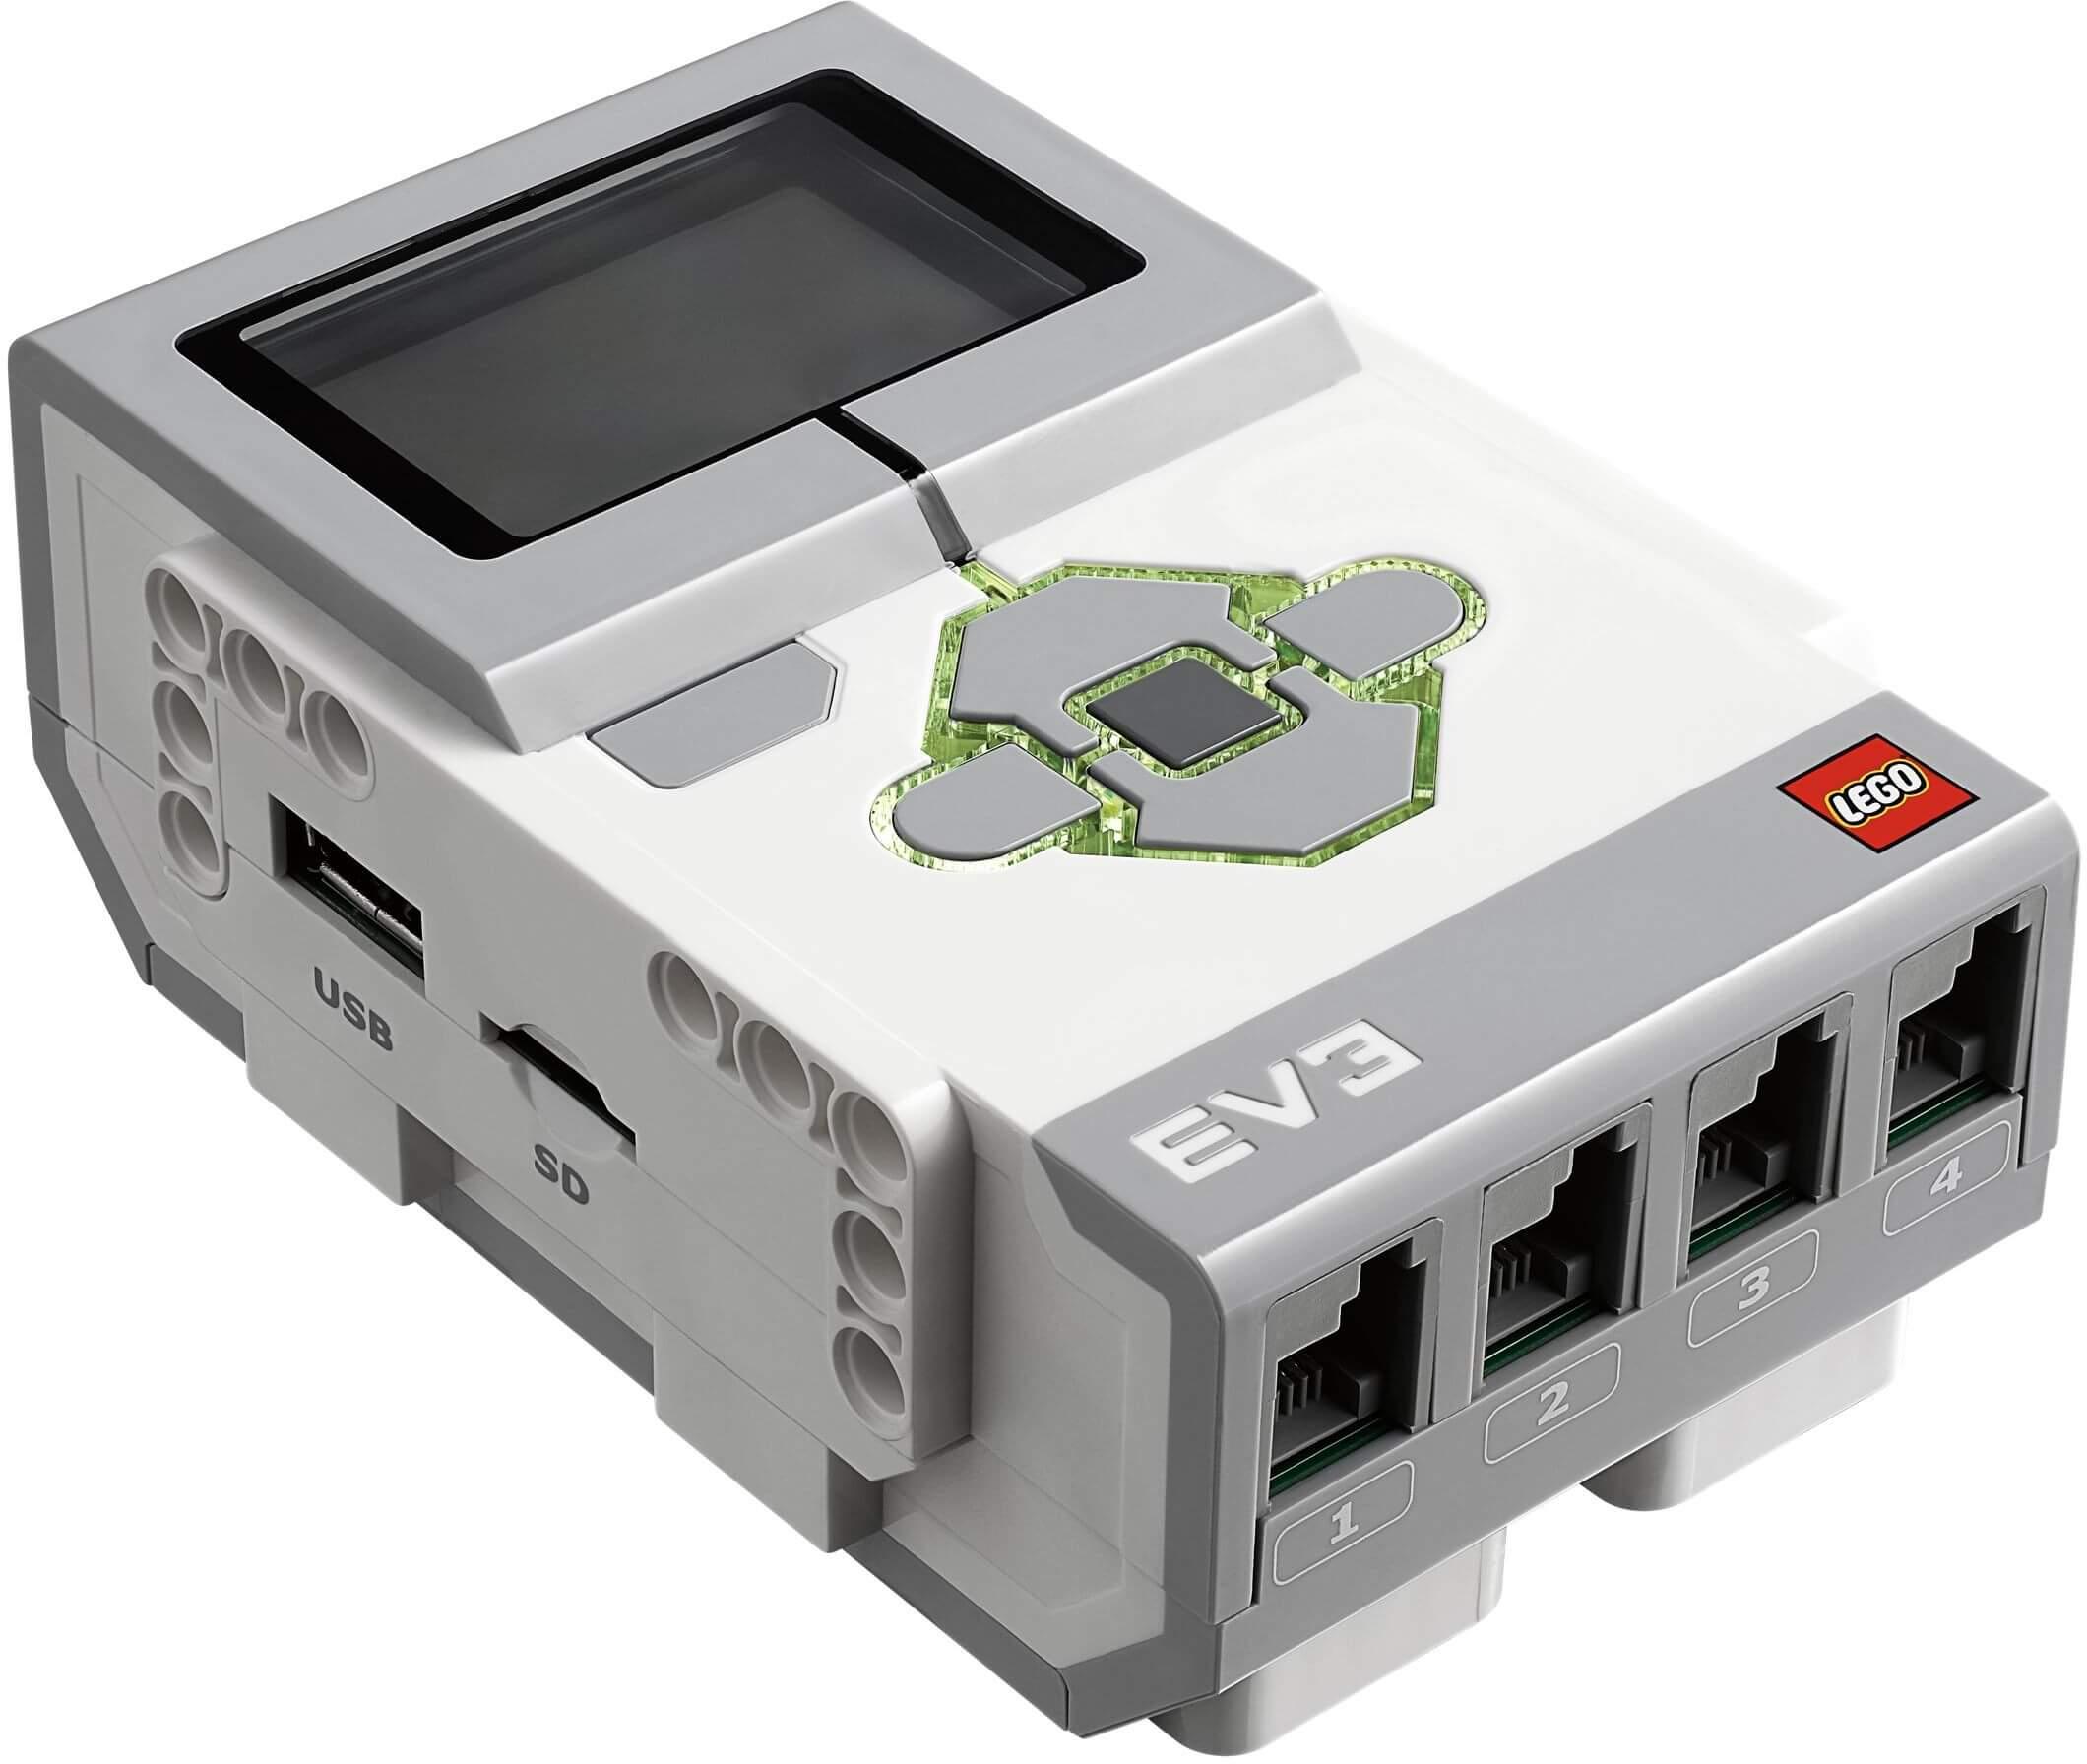 Mua đồ chơi LEGO 45500 - LEGO Mindstorms 45500 - Bộ vi xử lí trung tâm Mindstorms EV3